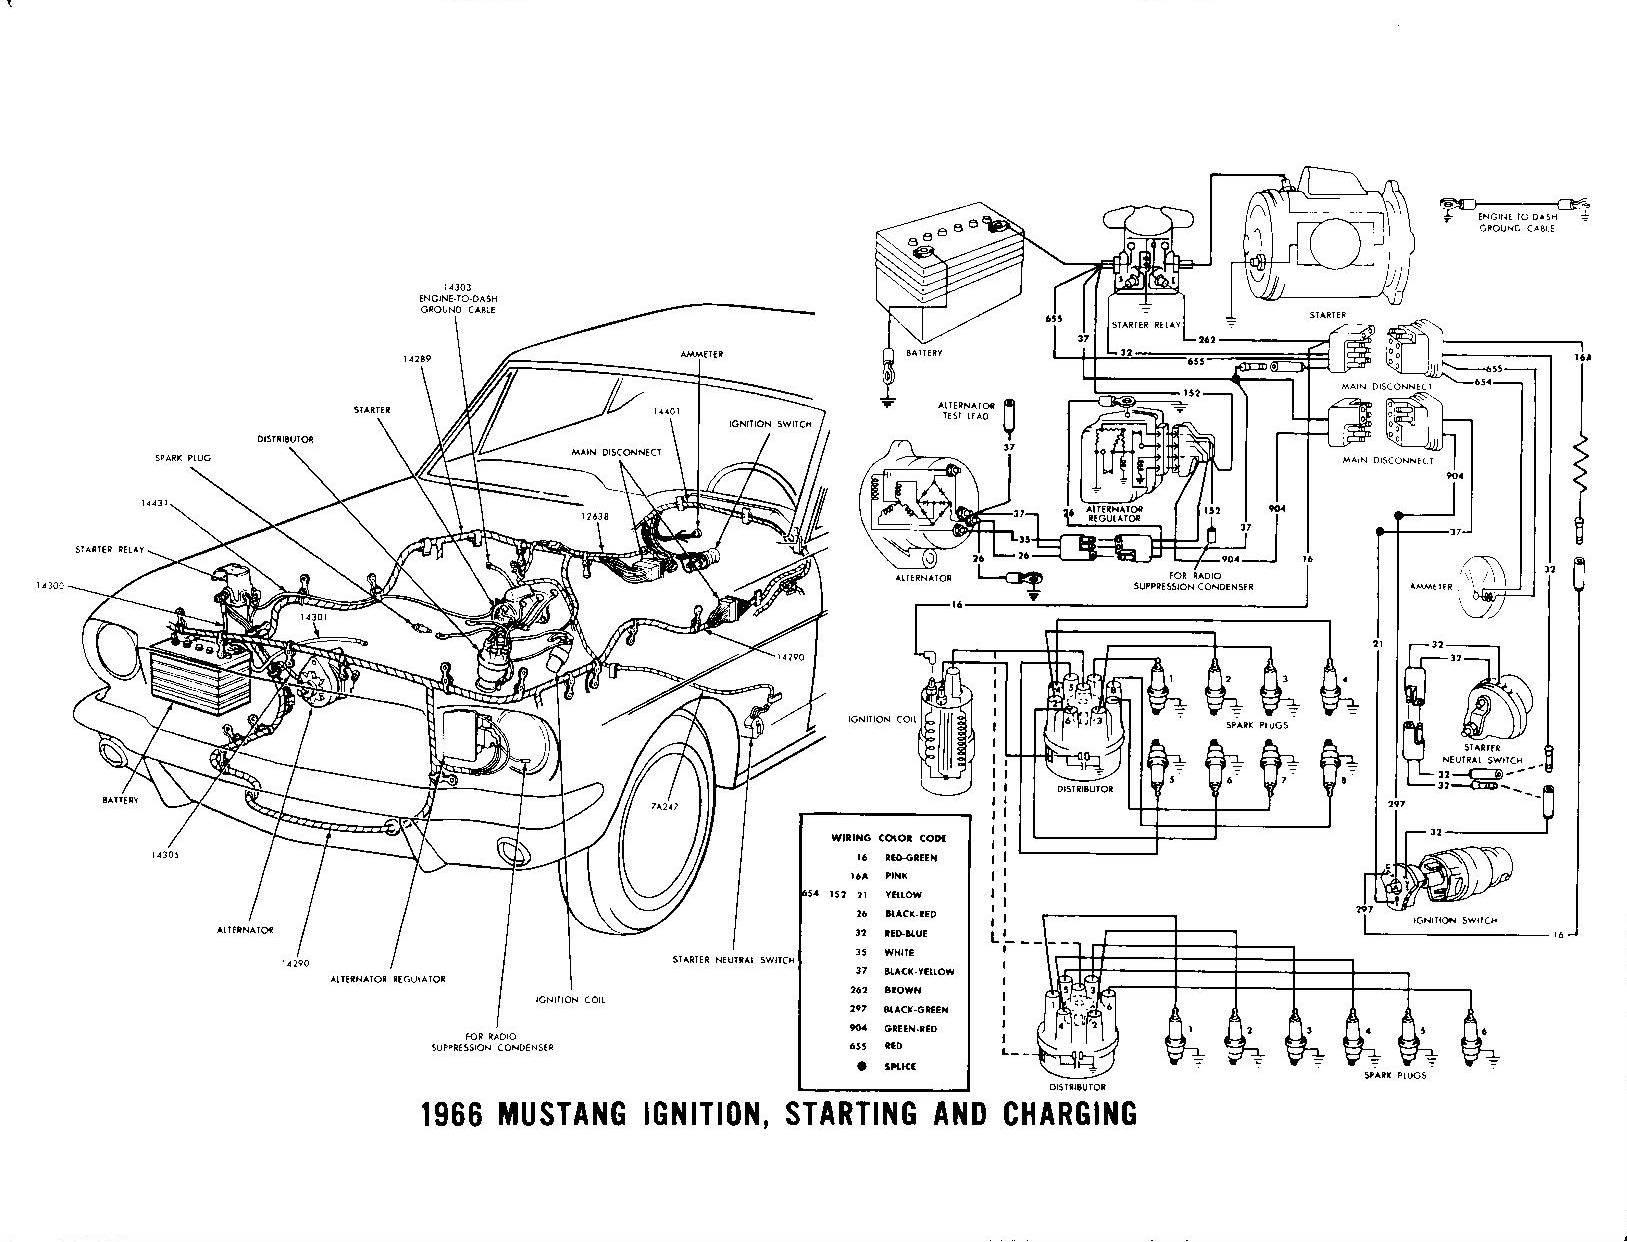 D Alternator Not Charging Ignition Starting Charging on Alternator Wiring Diagram Ford 1966